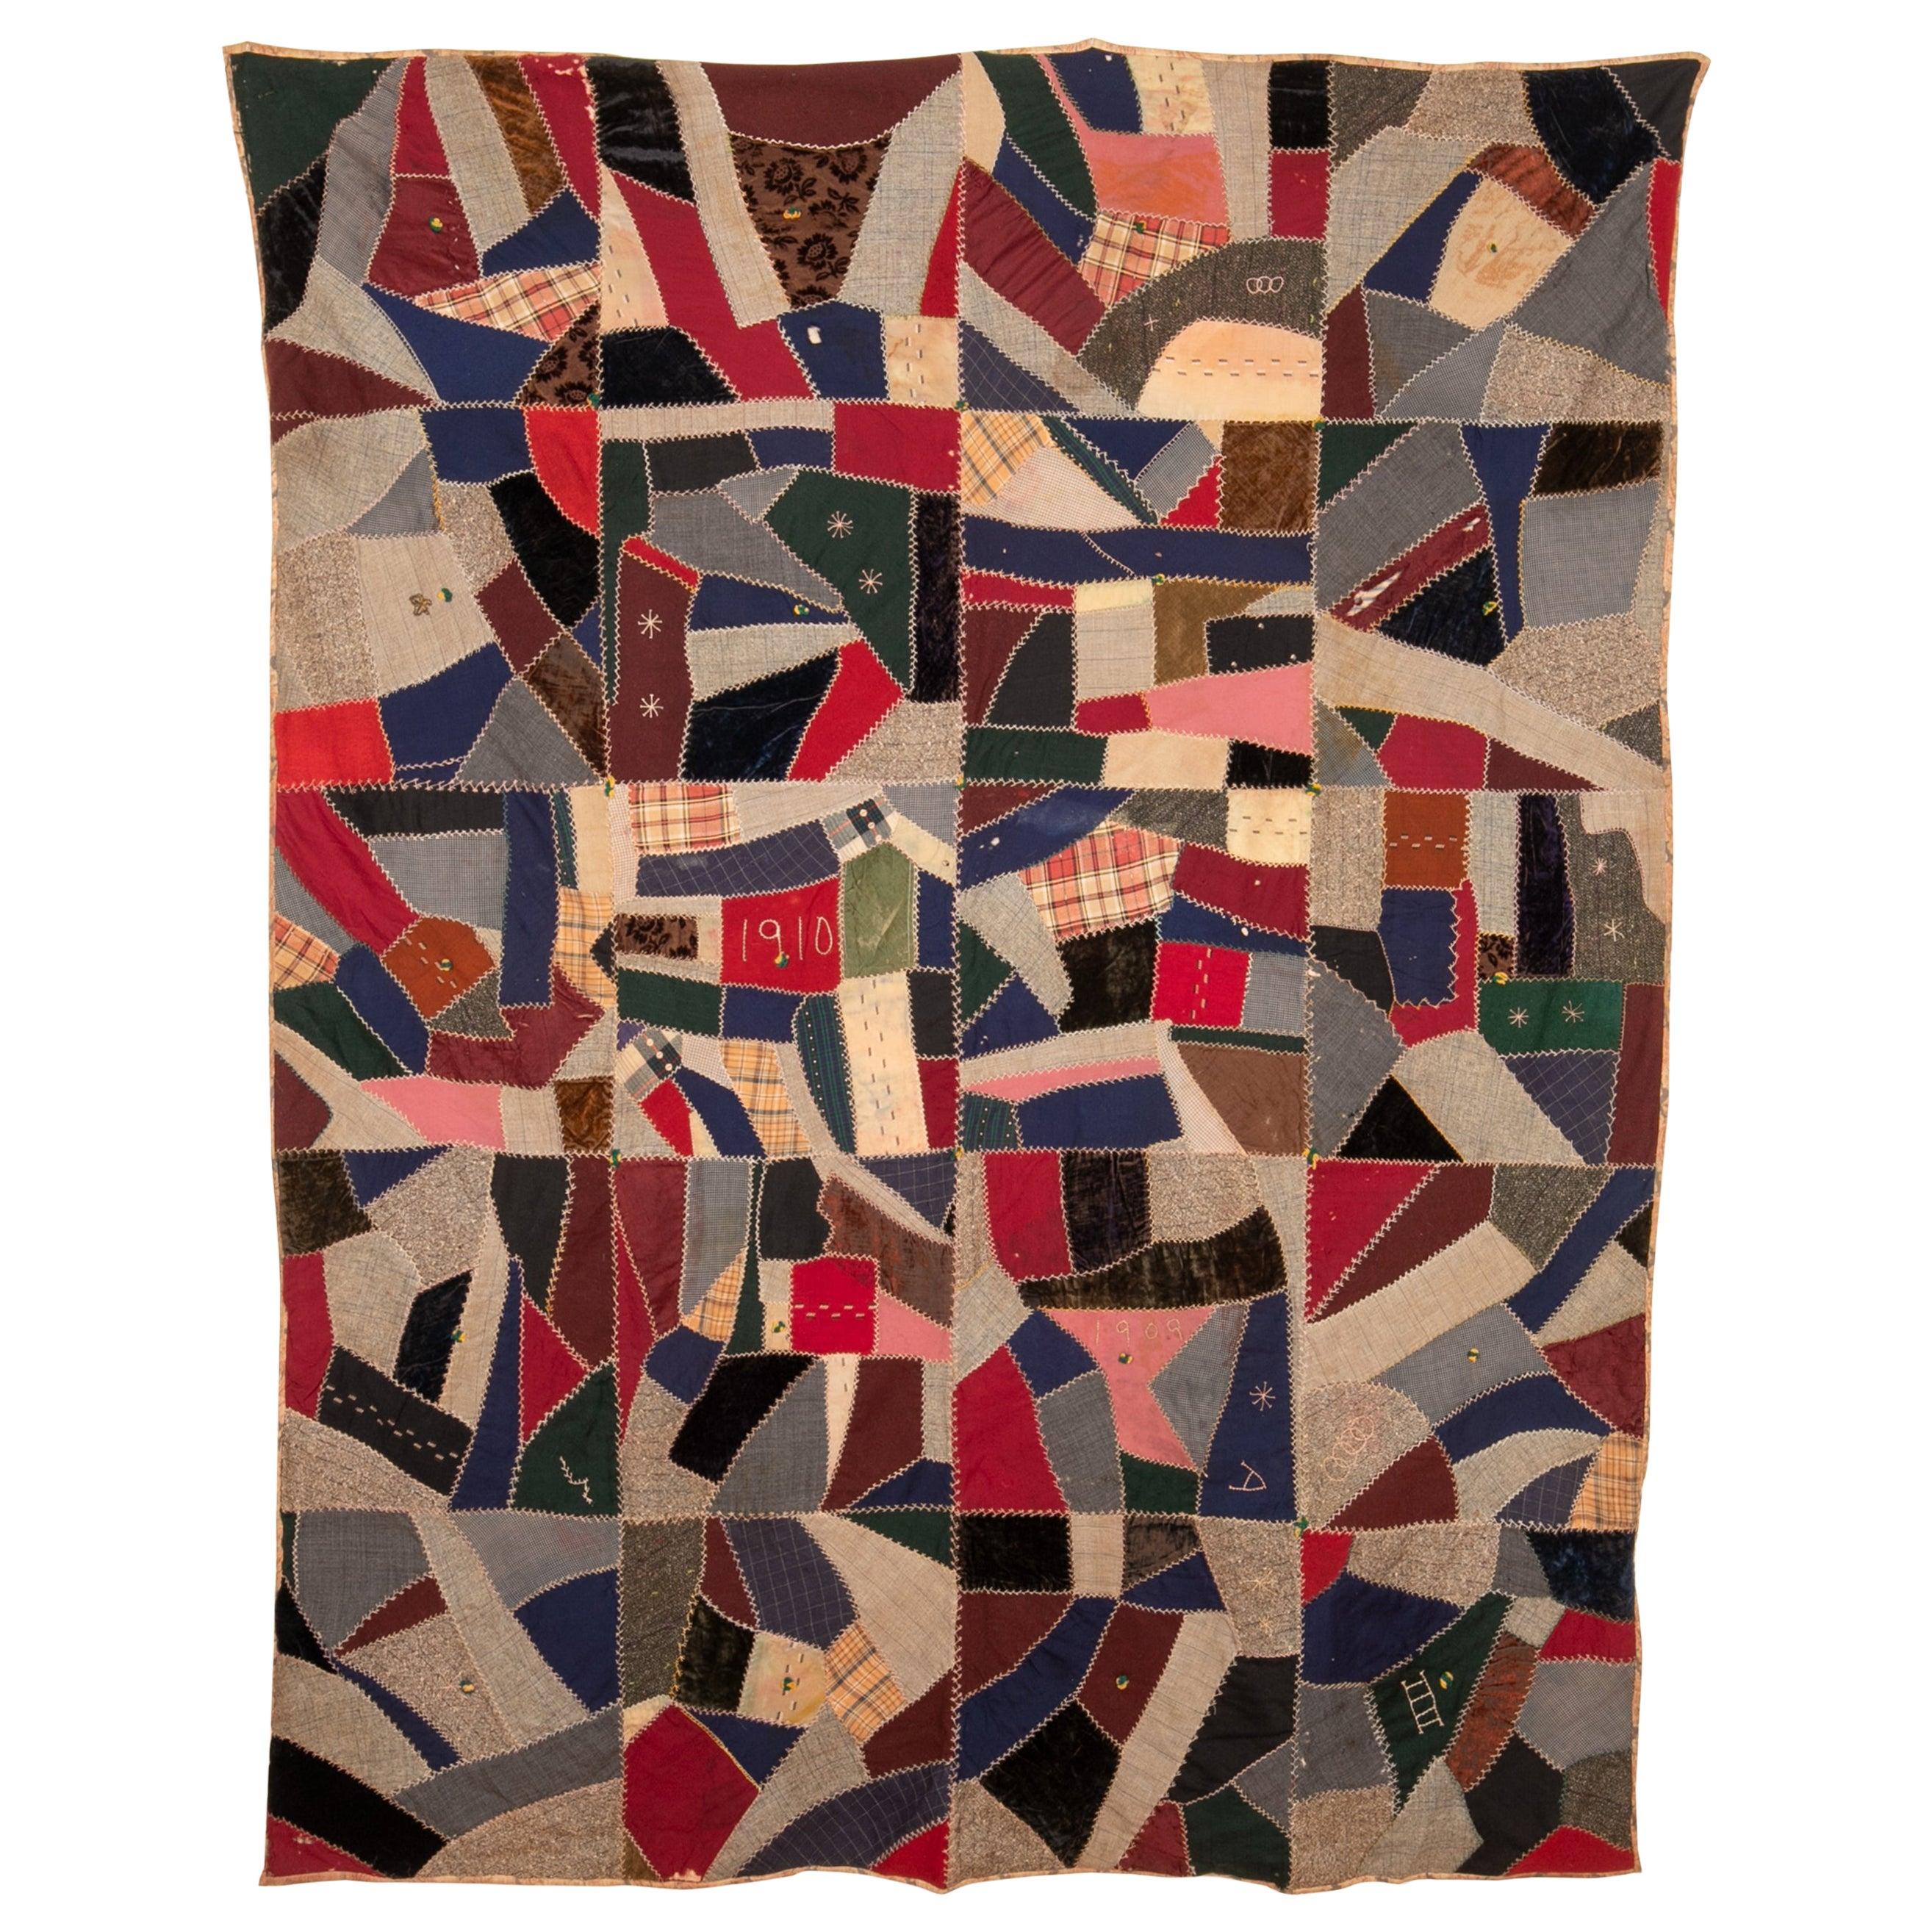 Antique American Crazy Quilt, Dated, 1909-1910